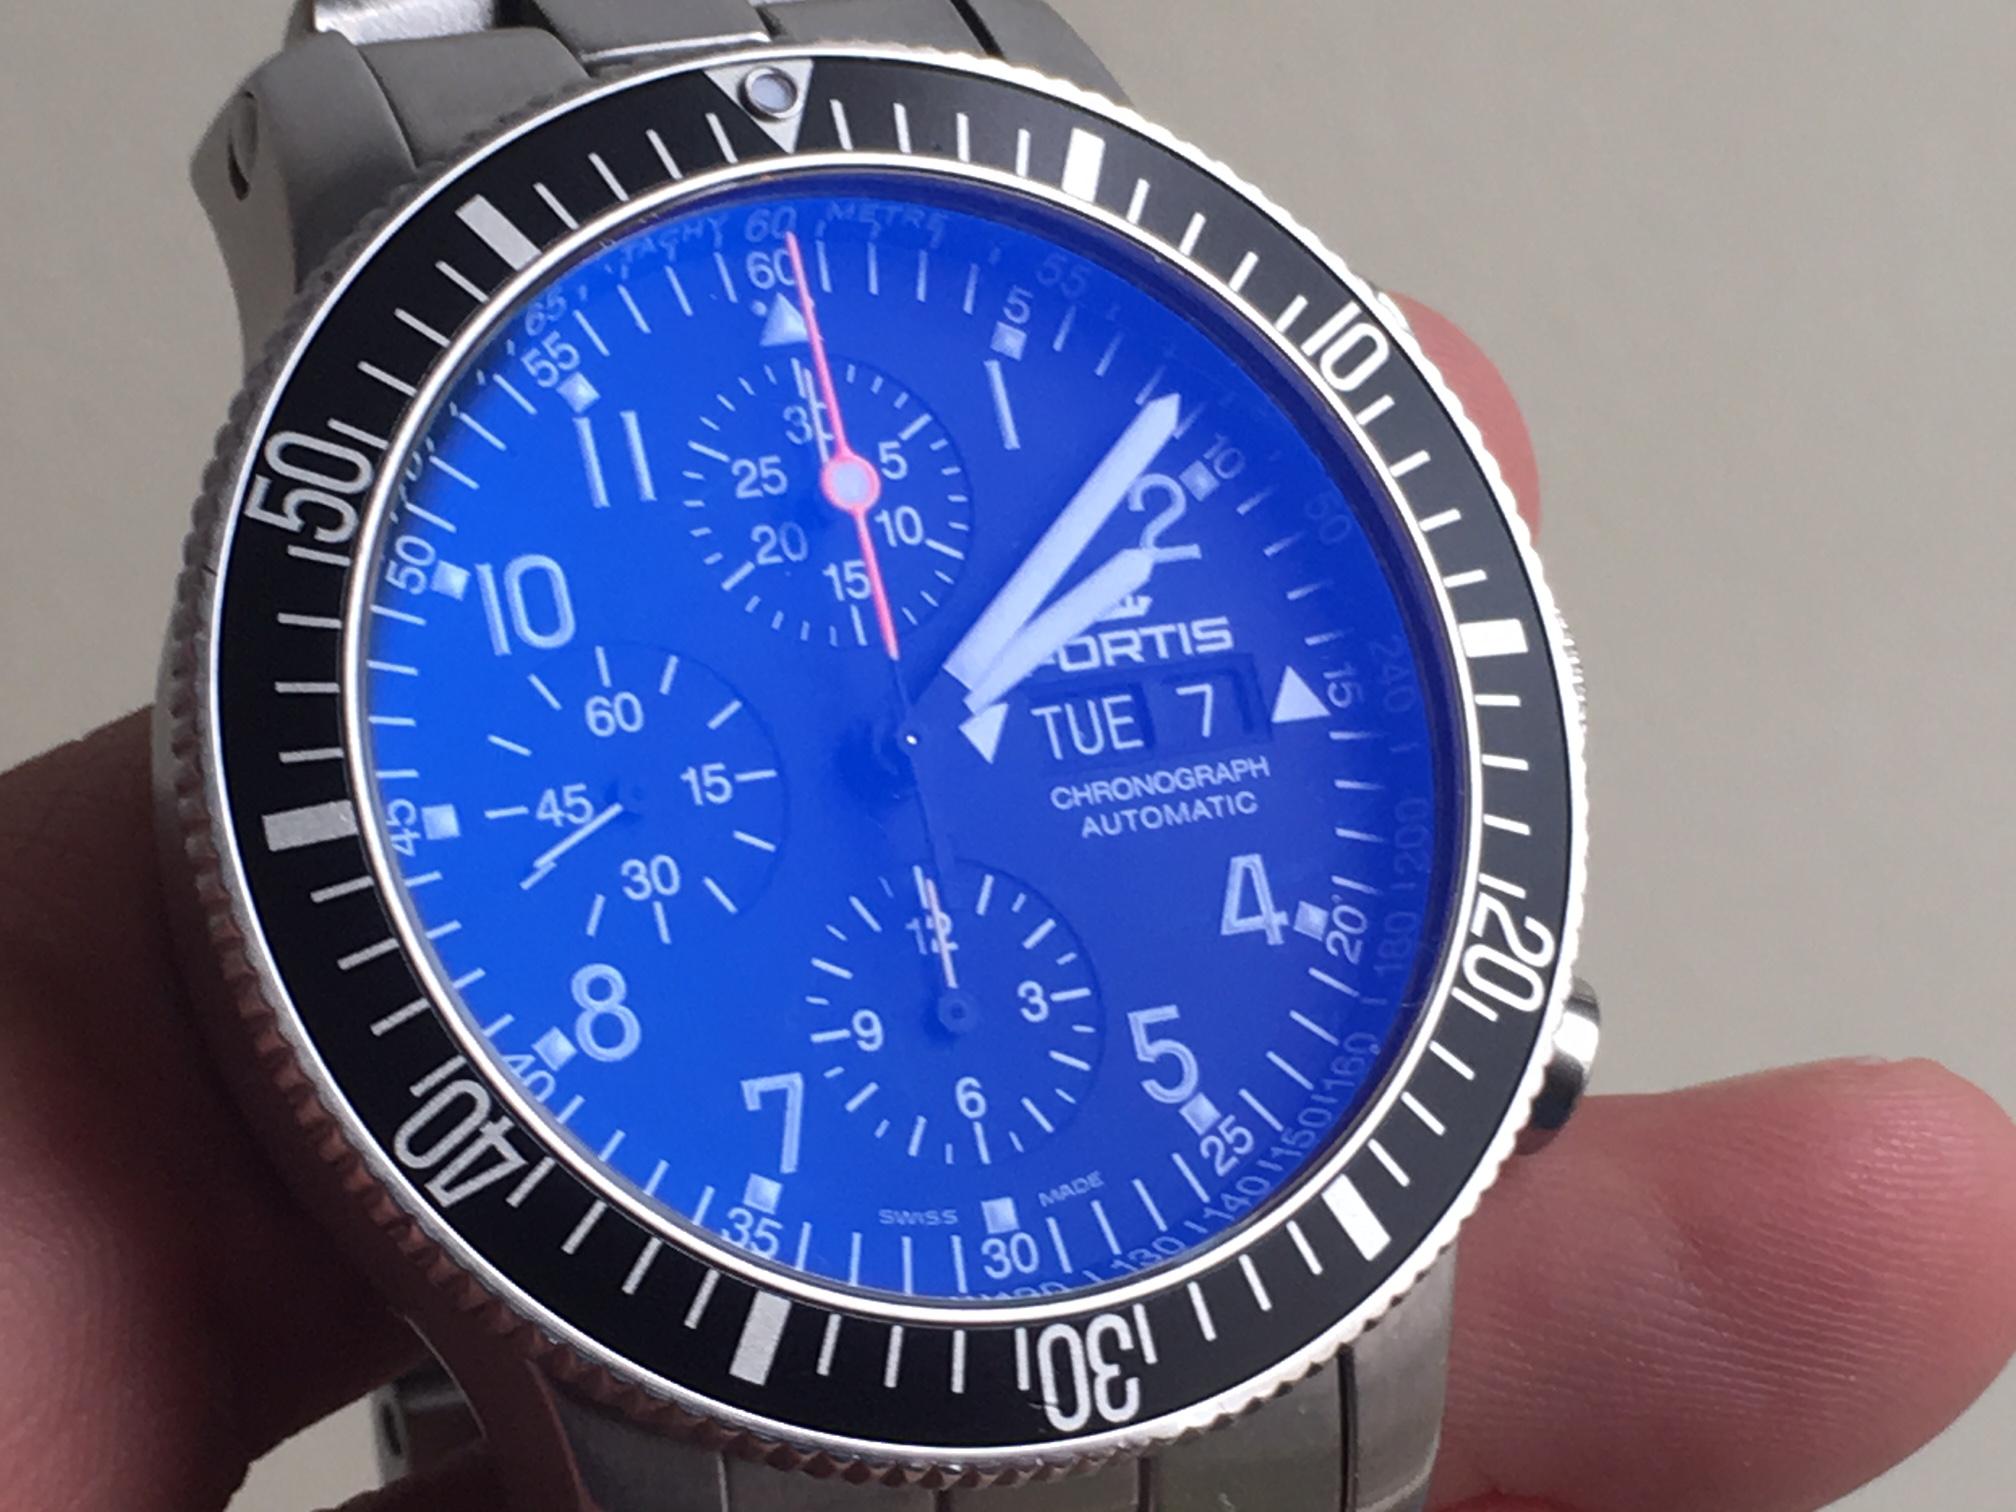 Fortis B-42 Official Cosmonauts Chronograph - Υπόλοιπες εταιρείες